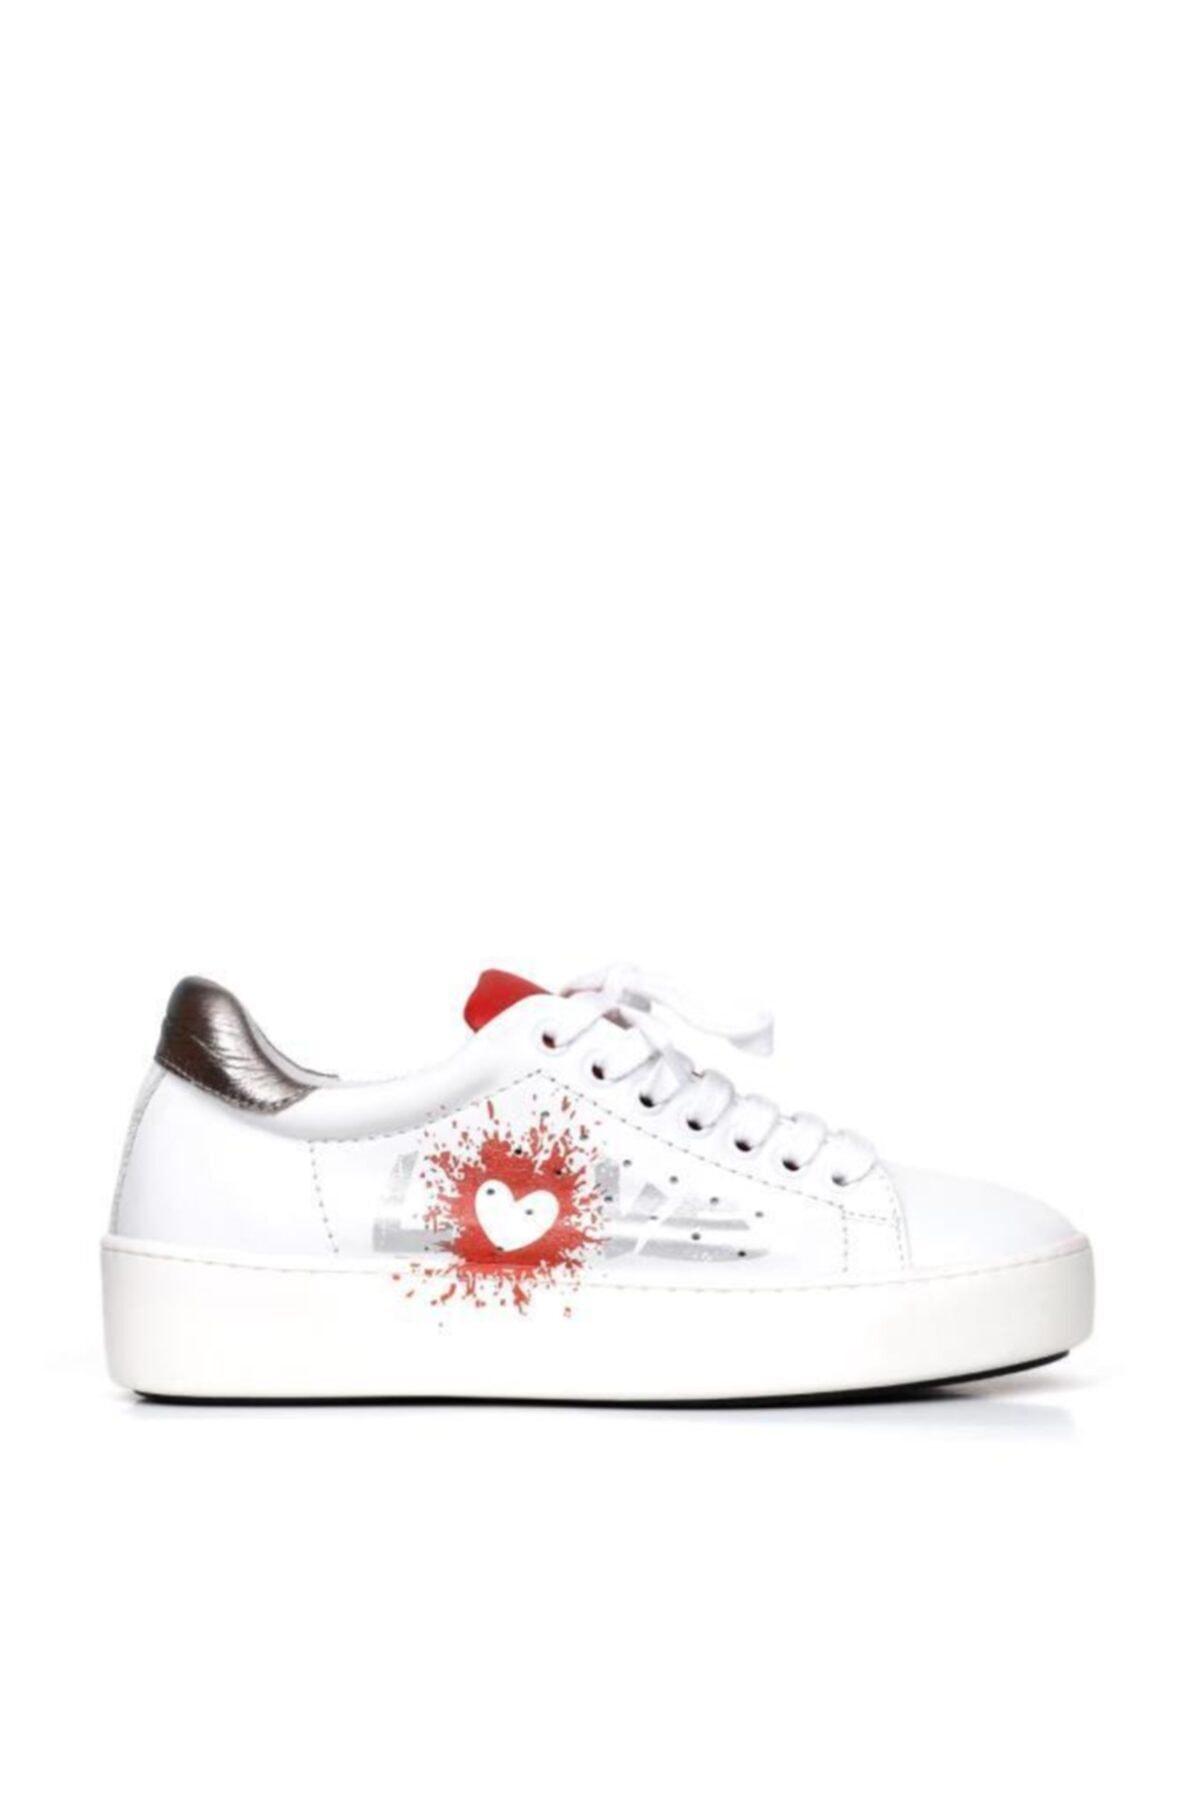 BUENO Shoes Kadın Spor 20wq5001-hea-lve 1